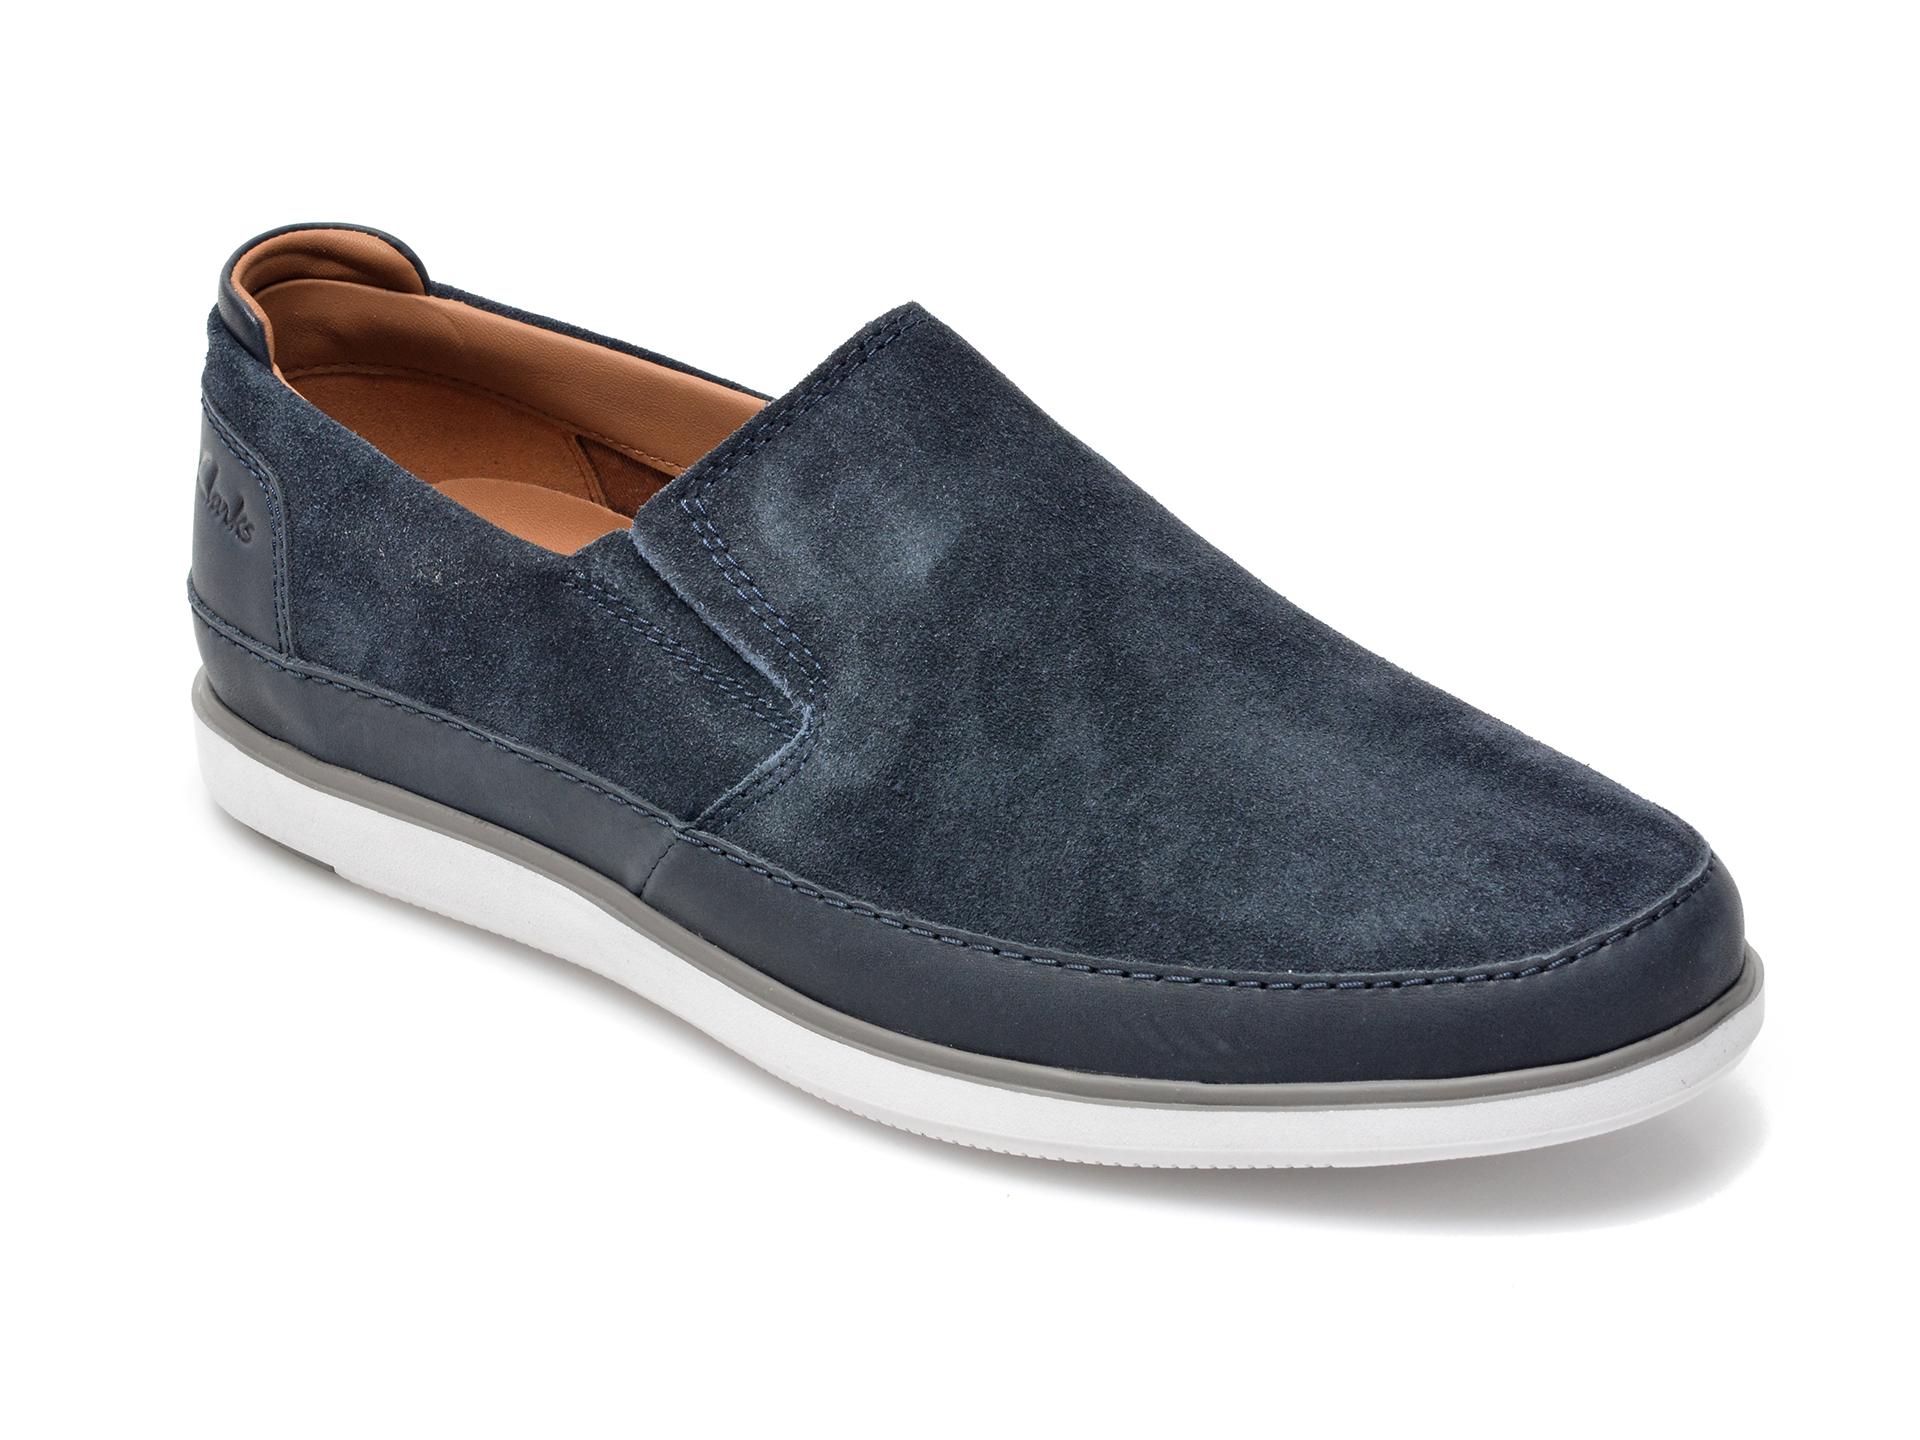 Pantofi Clarks Bleumarin, Bratton Step, Din Piele Intoarsa